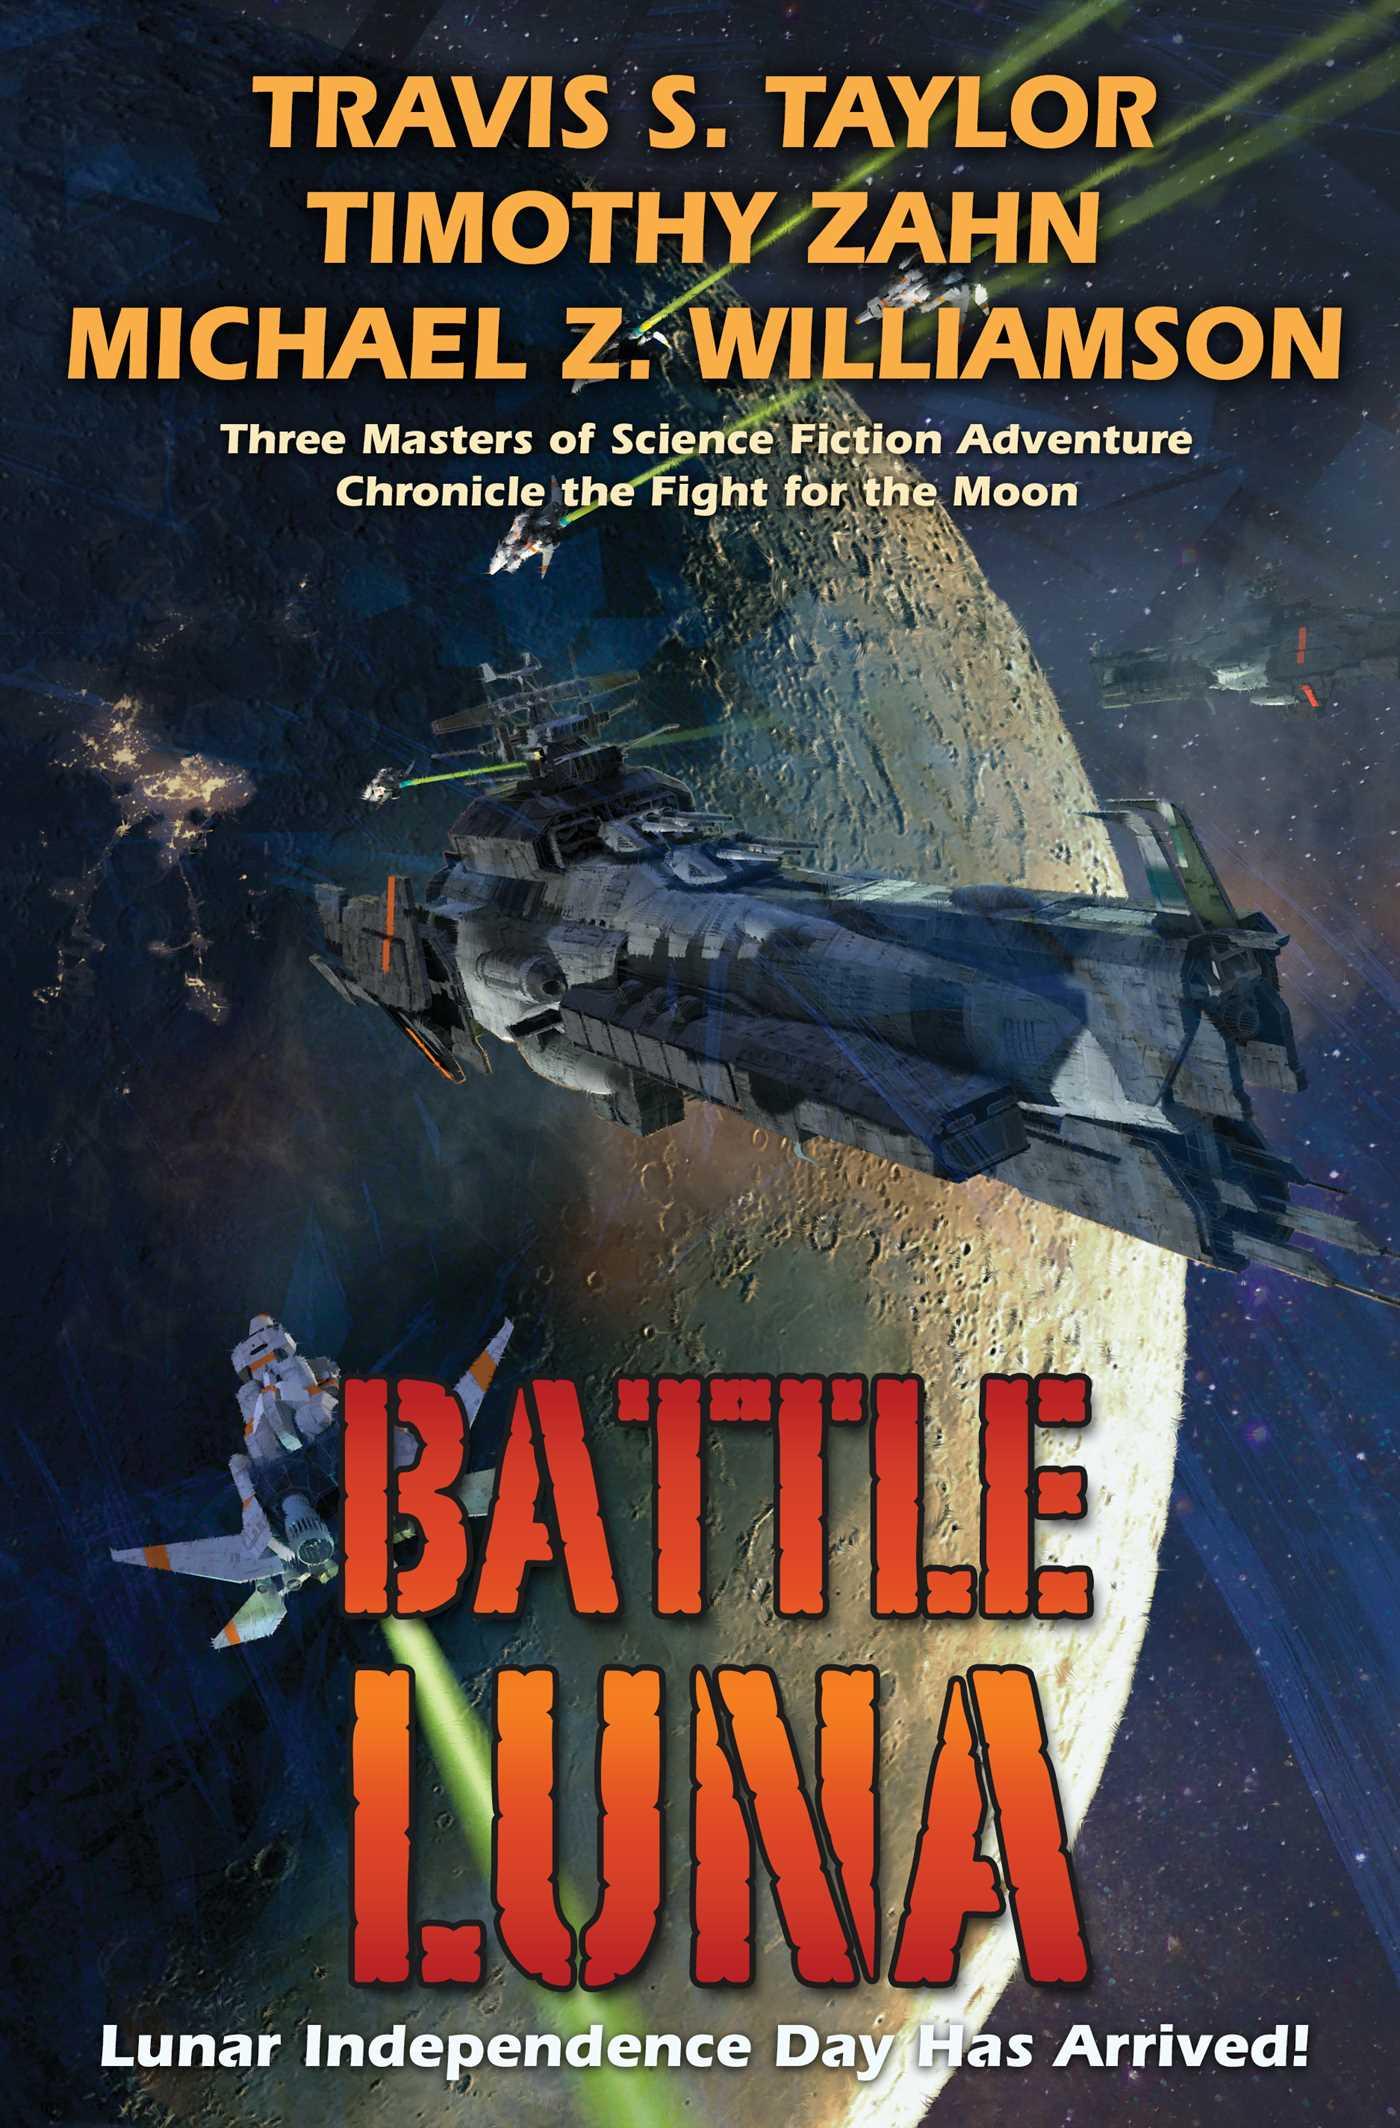 Battle Luna by Timothy Zahn, Travis S. Taylor, Michael Z. Williamson